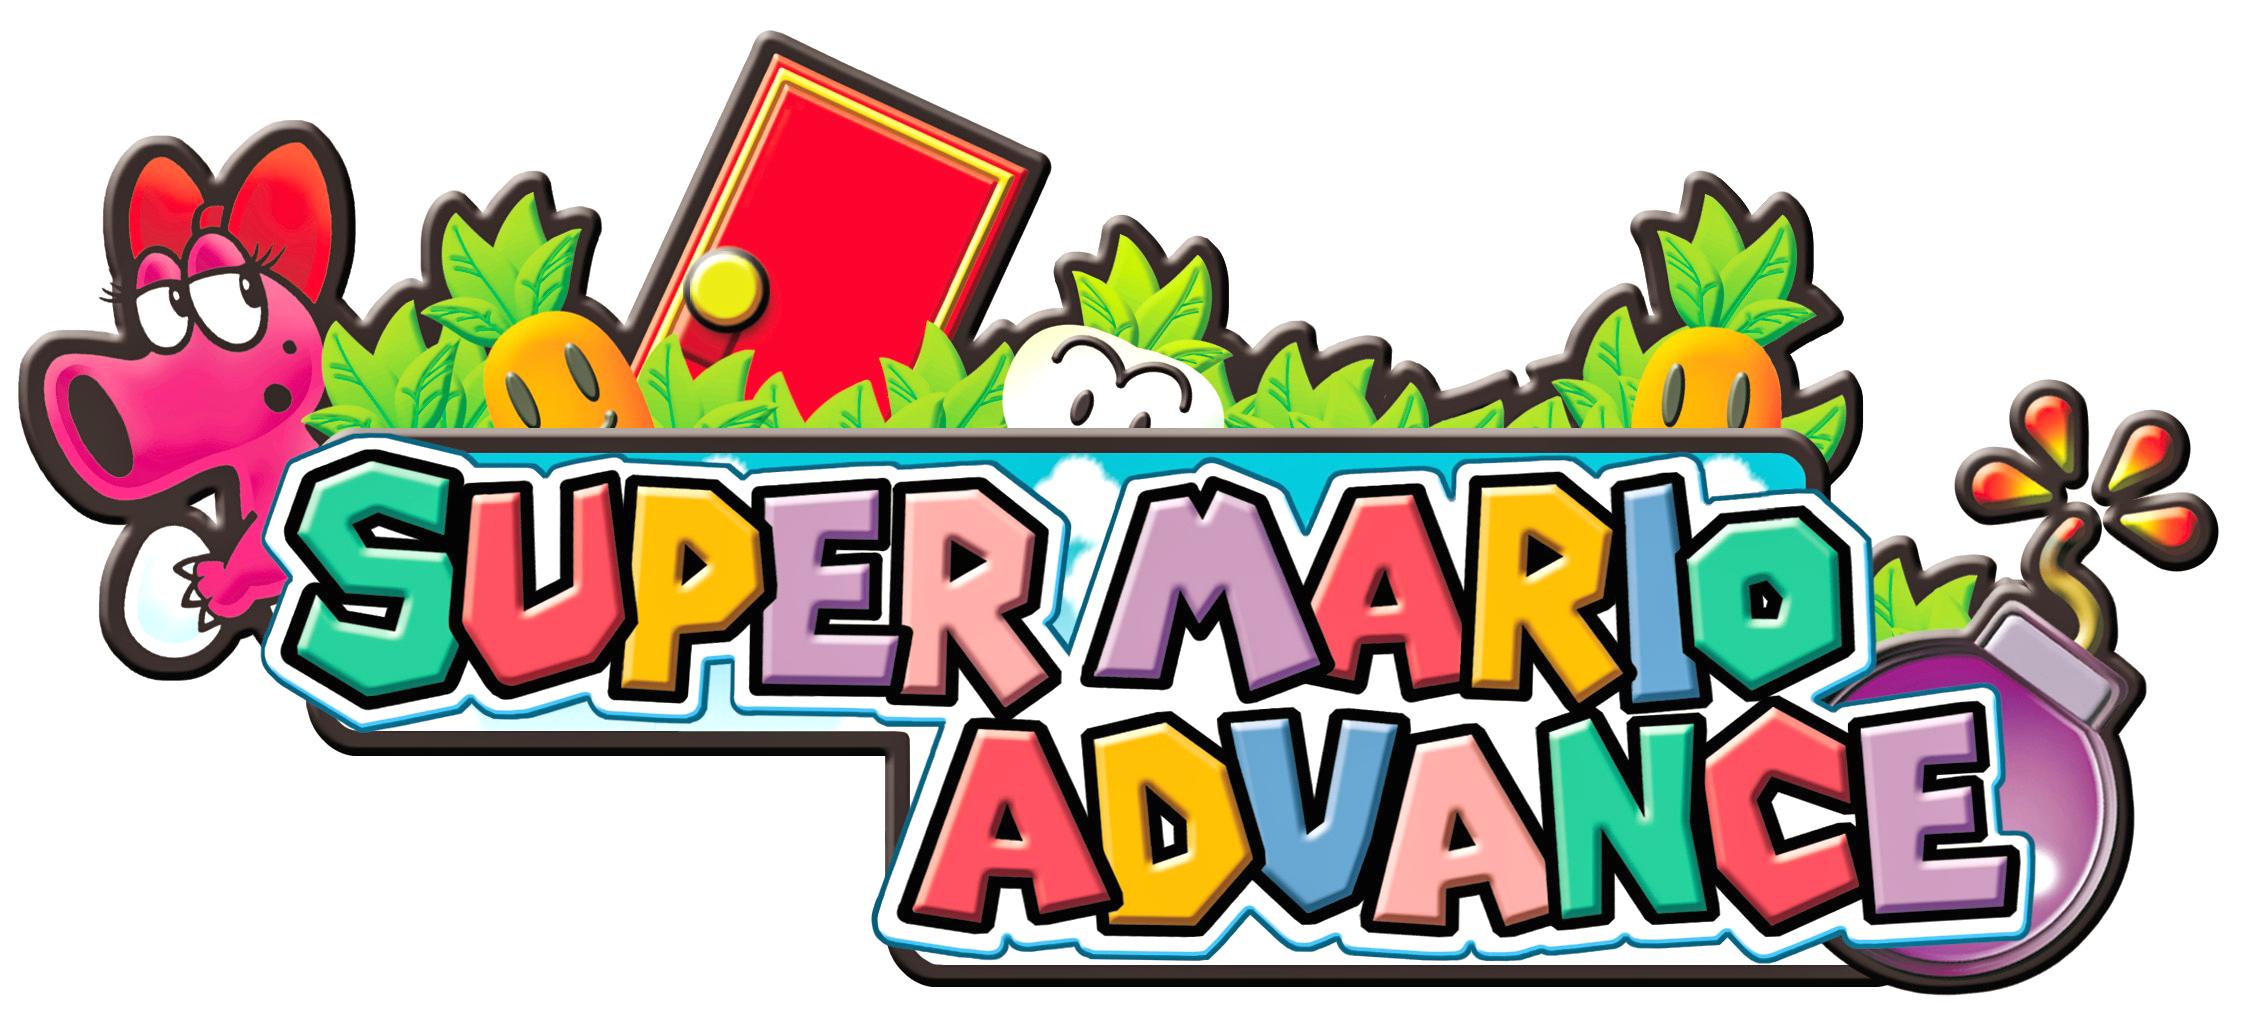 Image result for super mario advance logo